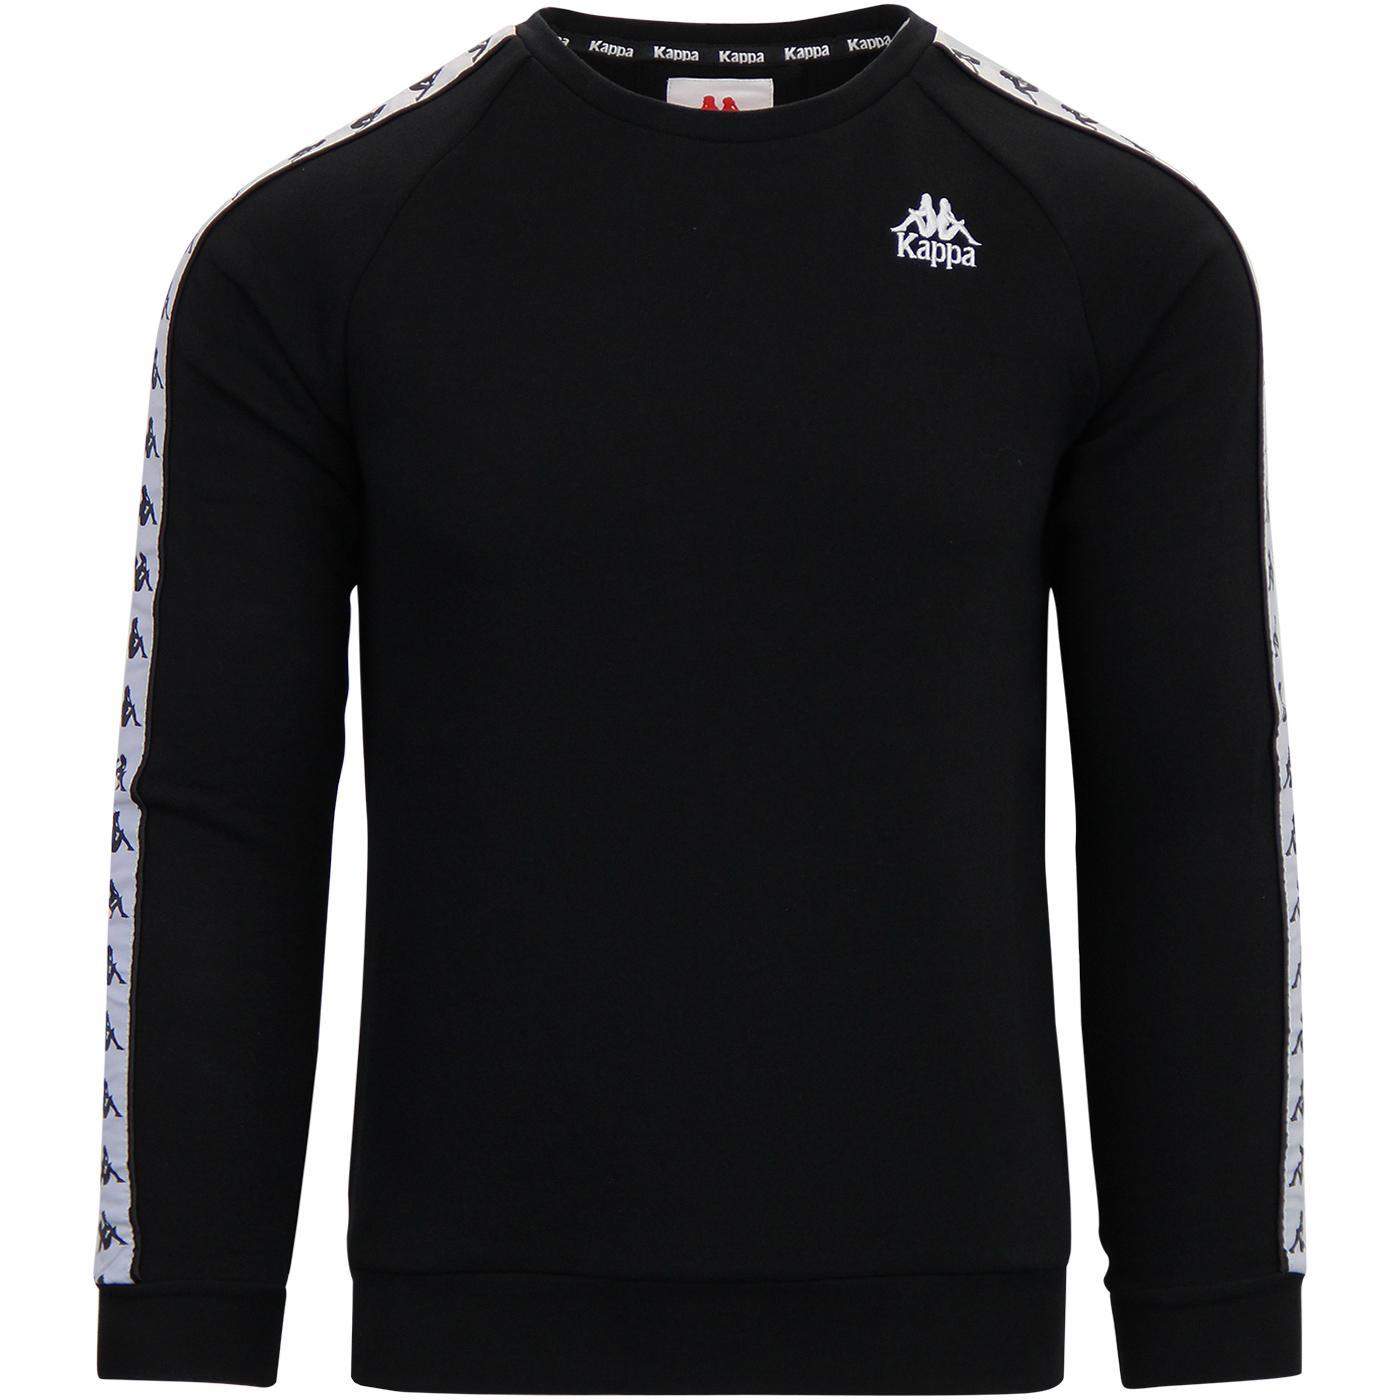 Arbir Banda KAPPA Retro Taped Sleeve Sweatshirt B